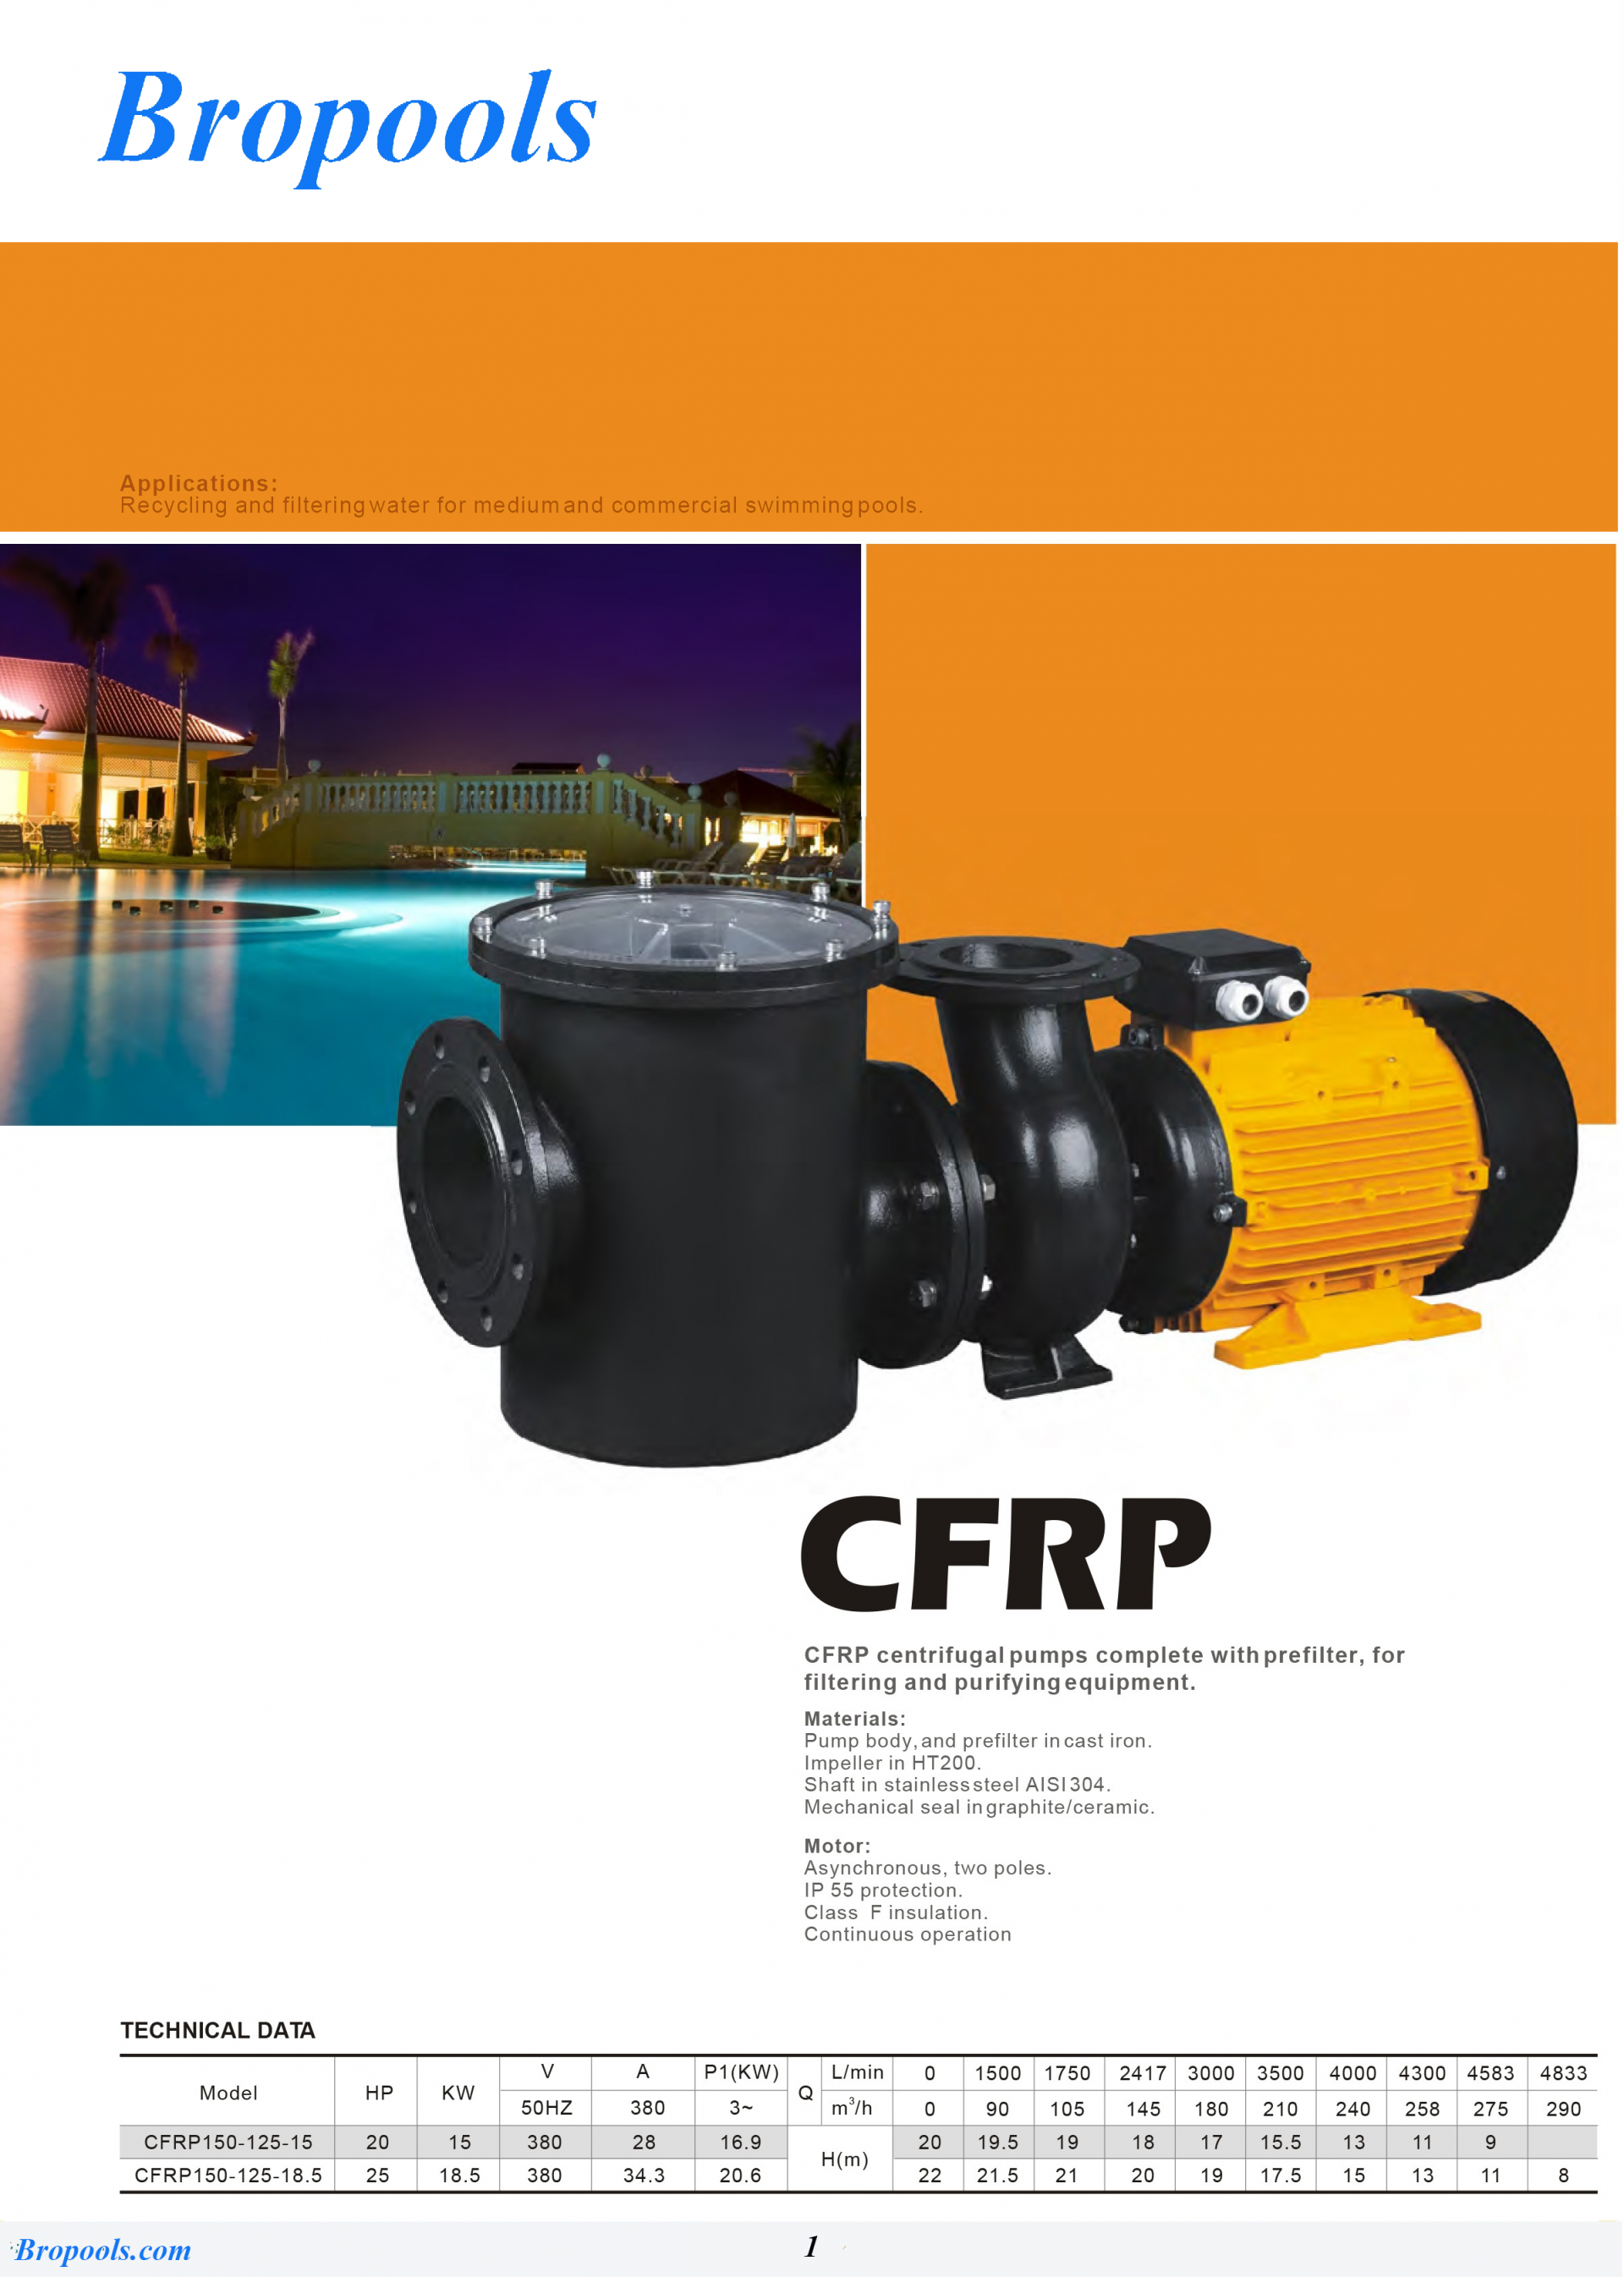 CFRP Pumps